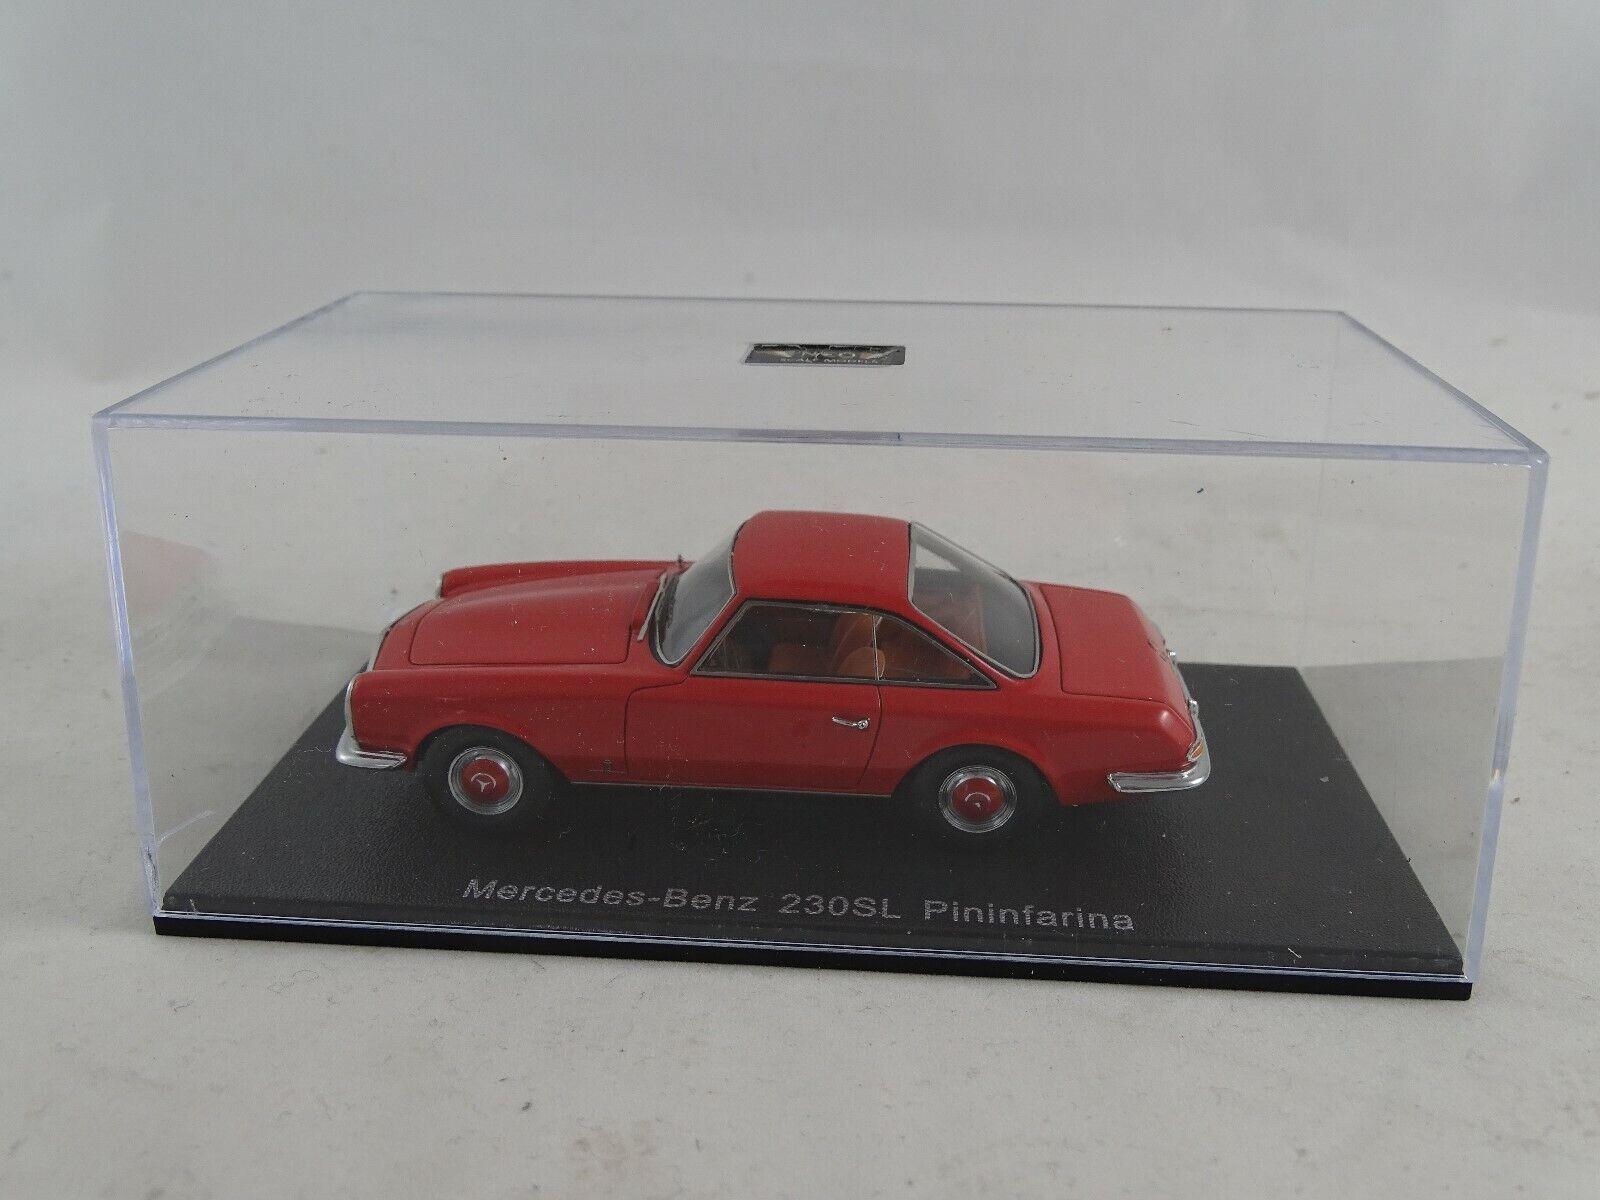 1 43 Neo Modells Mercedes Benz 230 SL Pininfarina rot Neu OVP